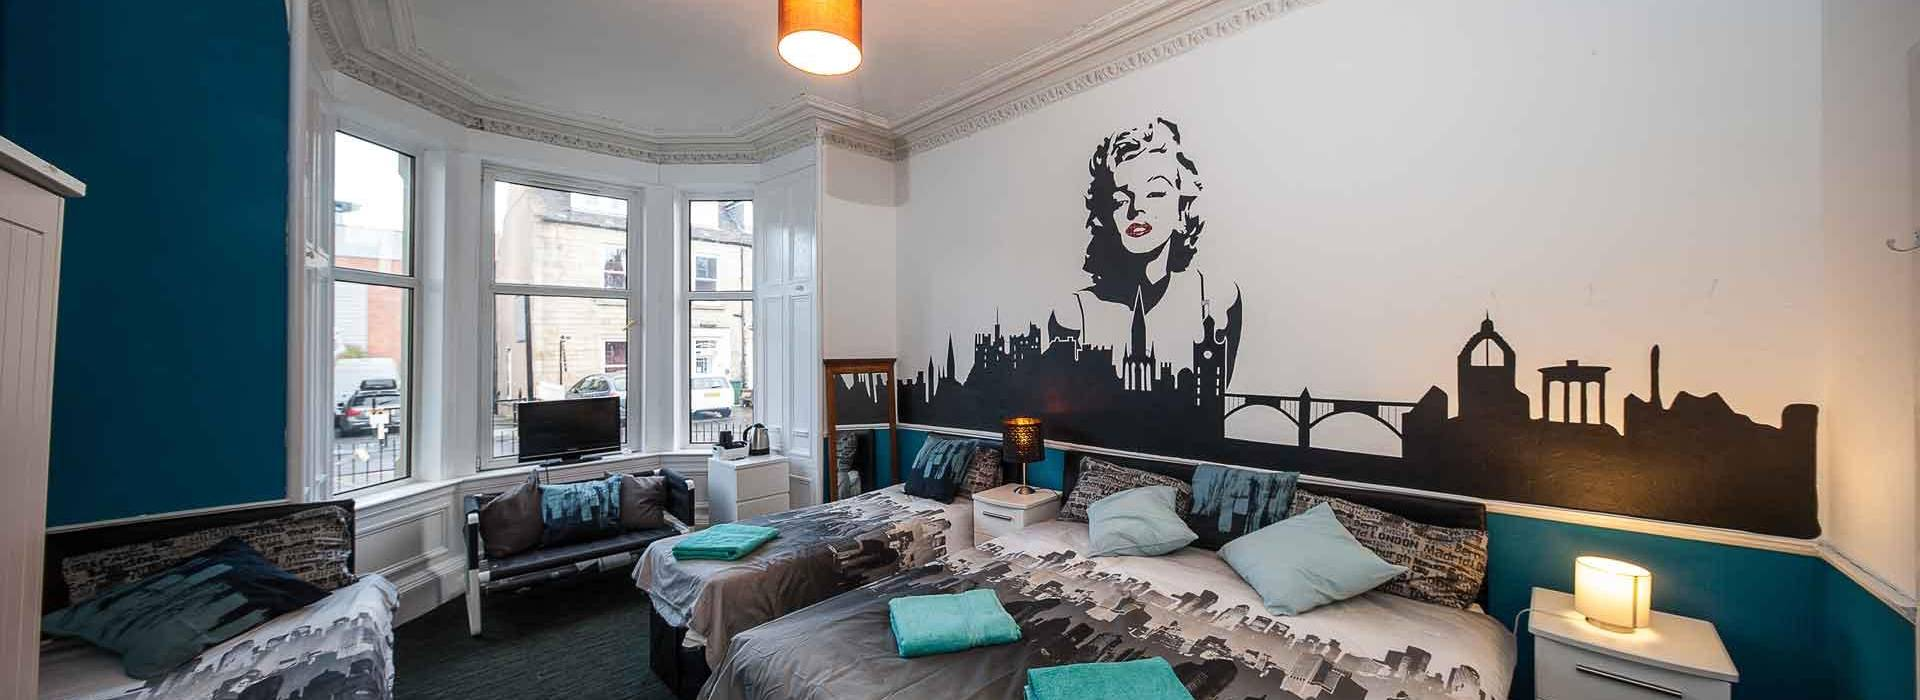 Stag Accommodation Edinburgh Marilyn